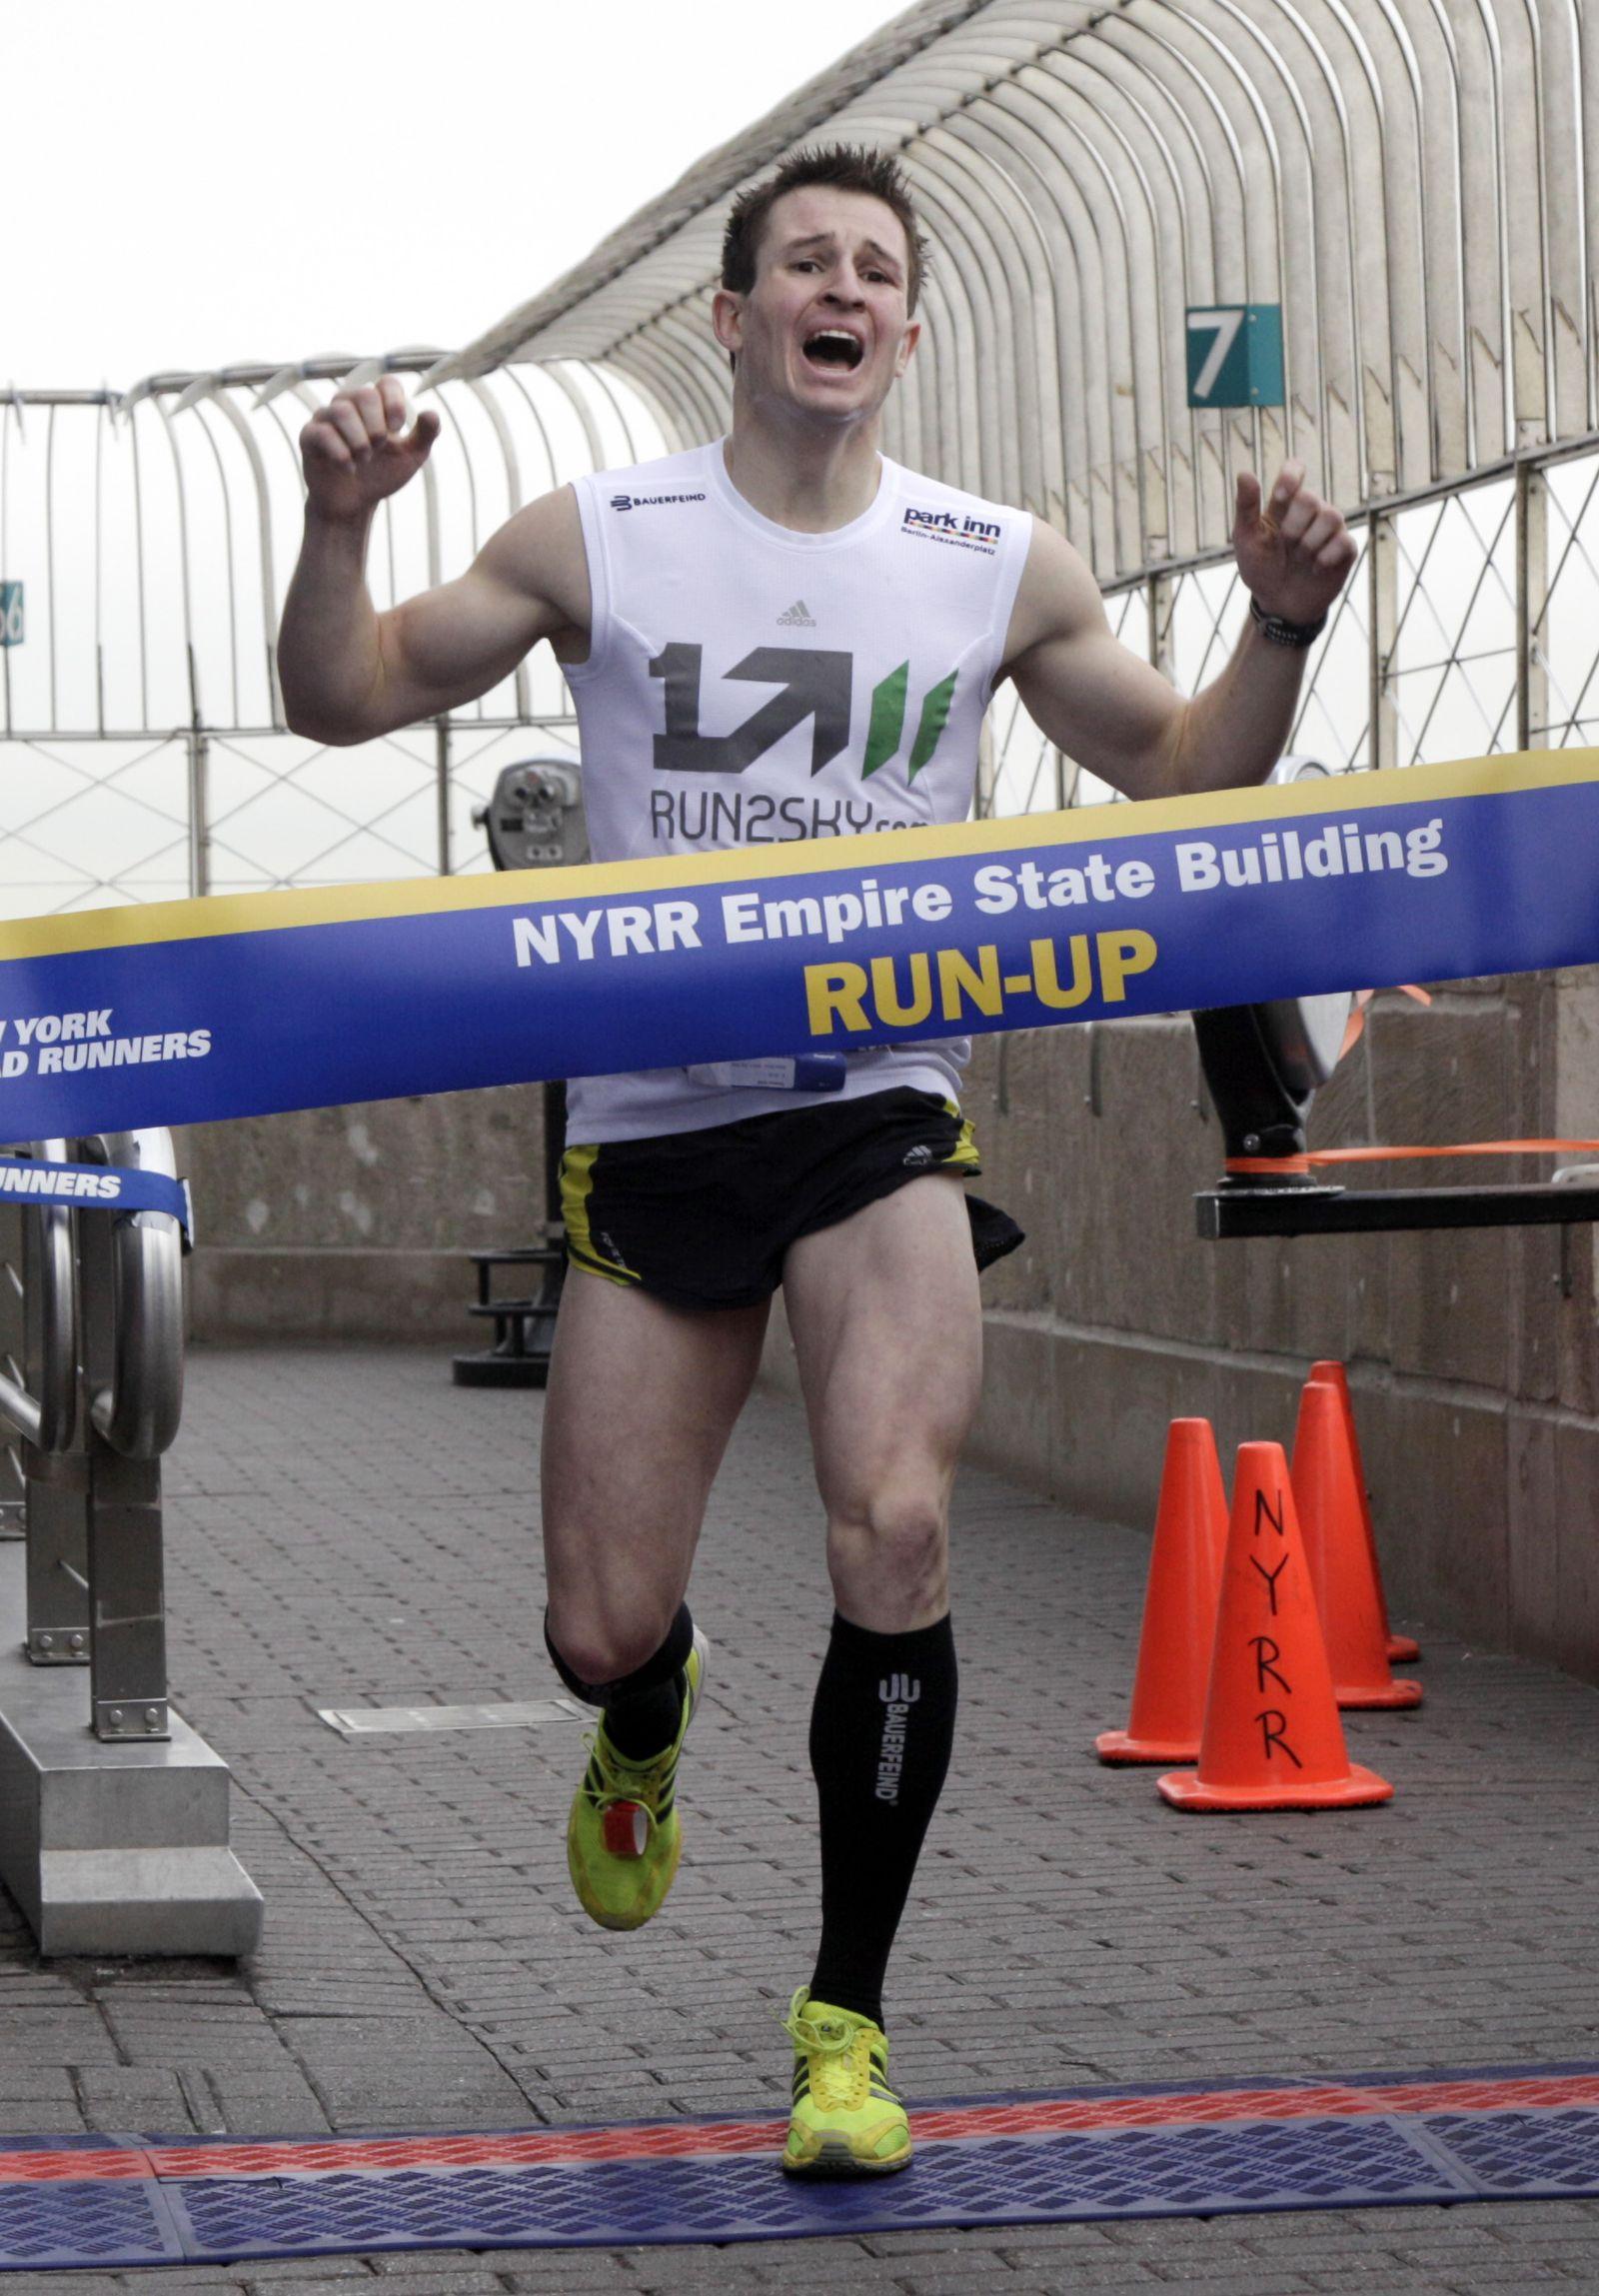 Empire State Run-up